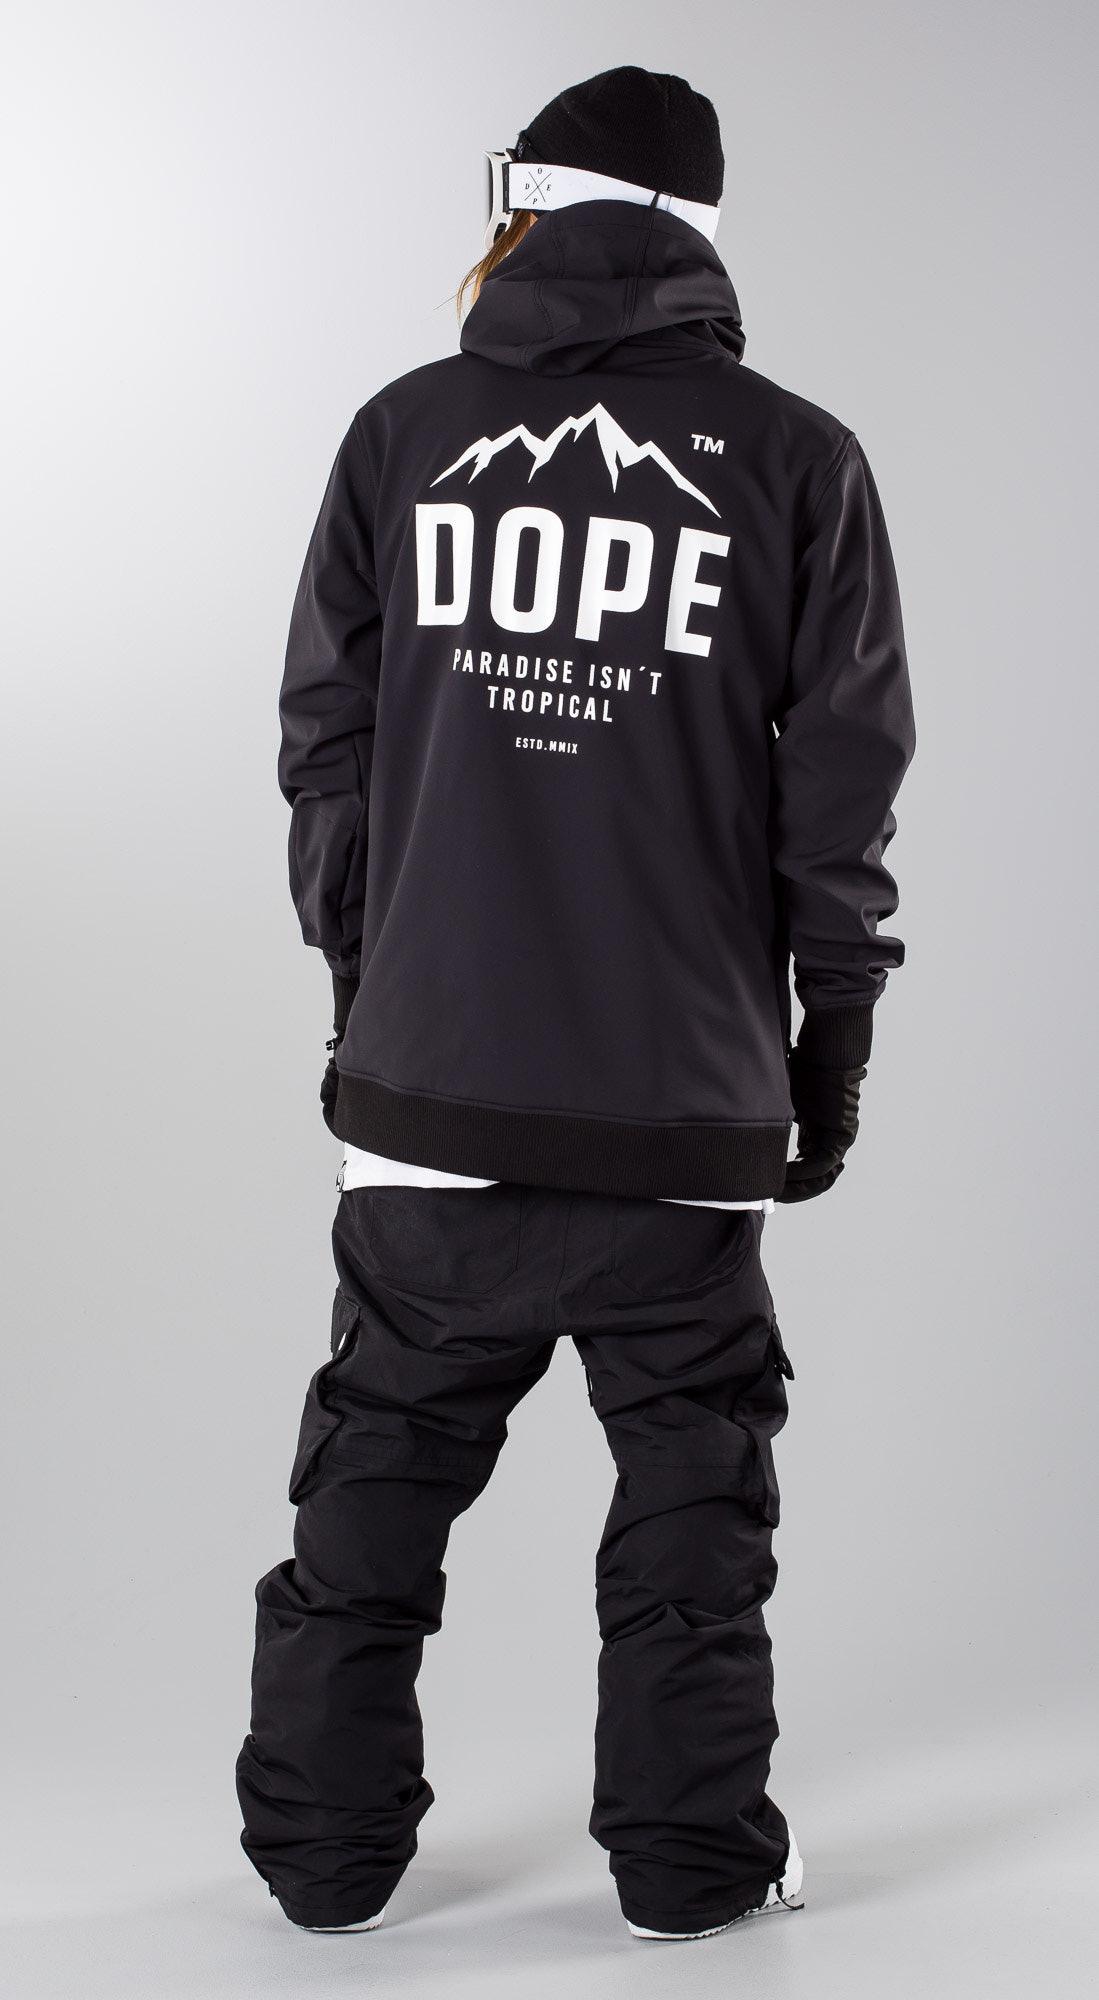 00cc68aa Snowboardklær fra Adidas, Dope & Burton - Fri frakt! - Ridestore.no